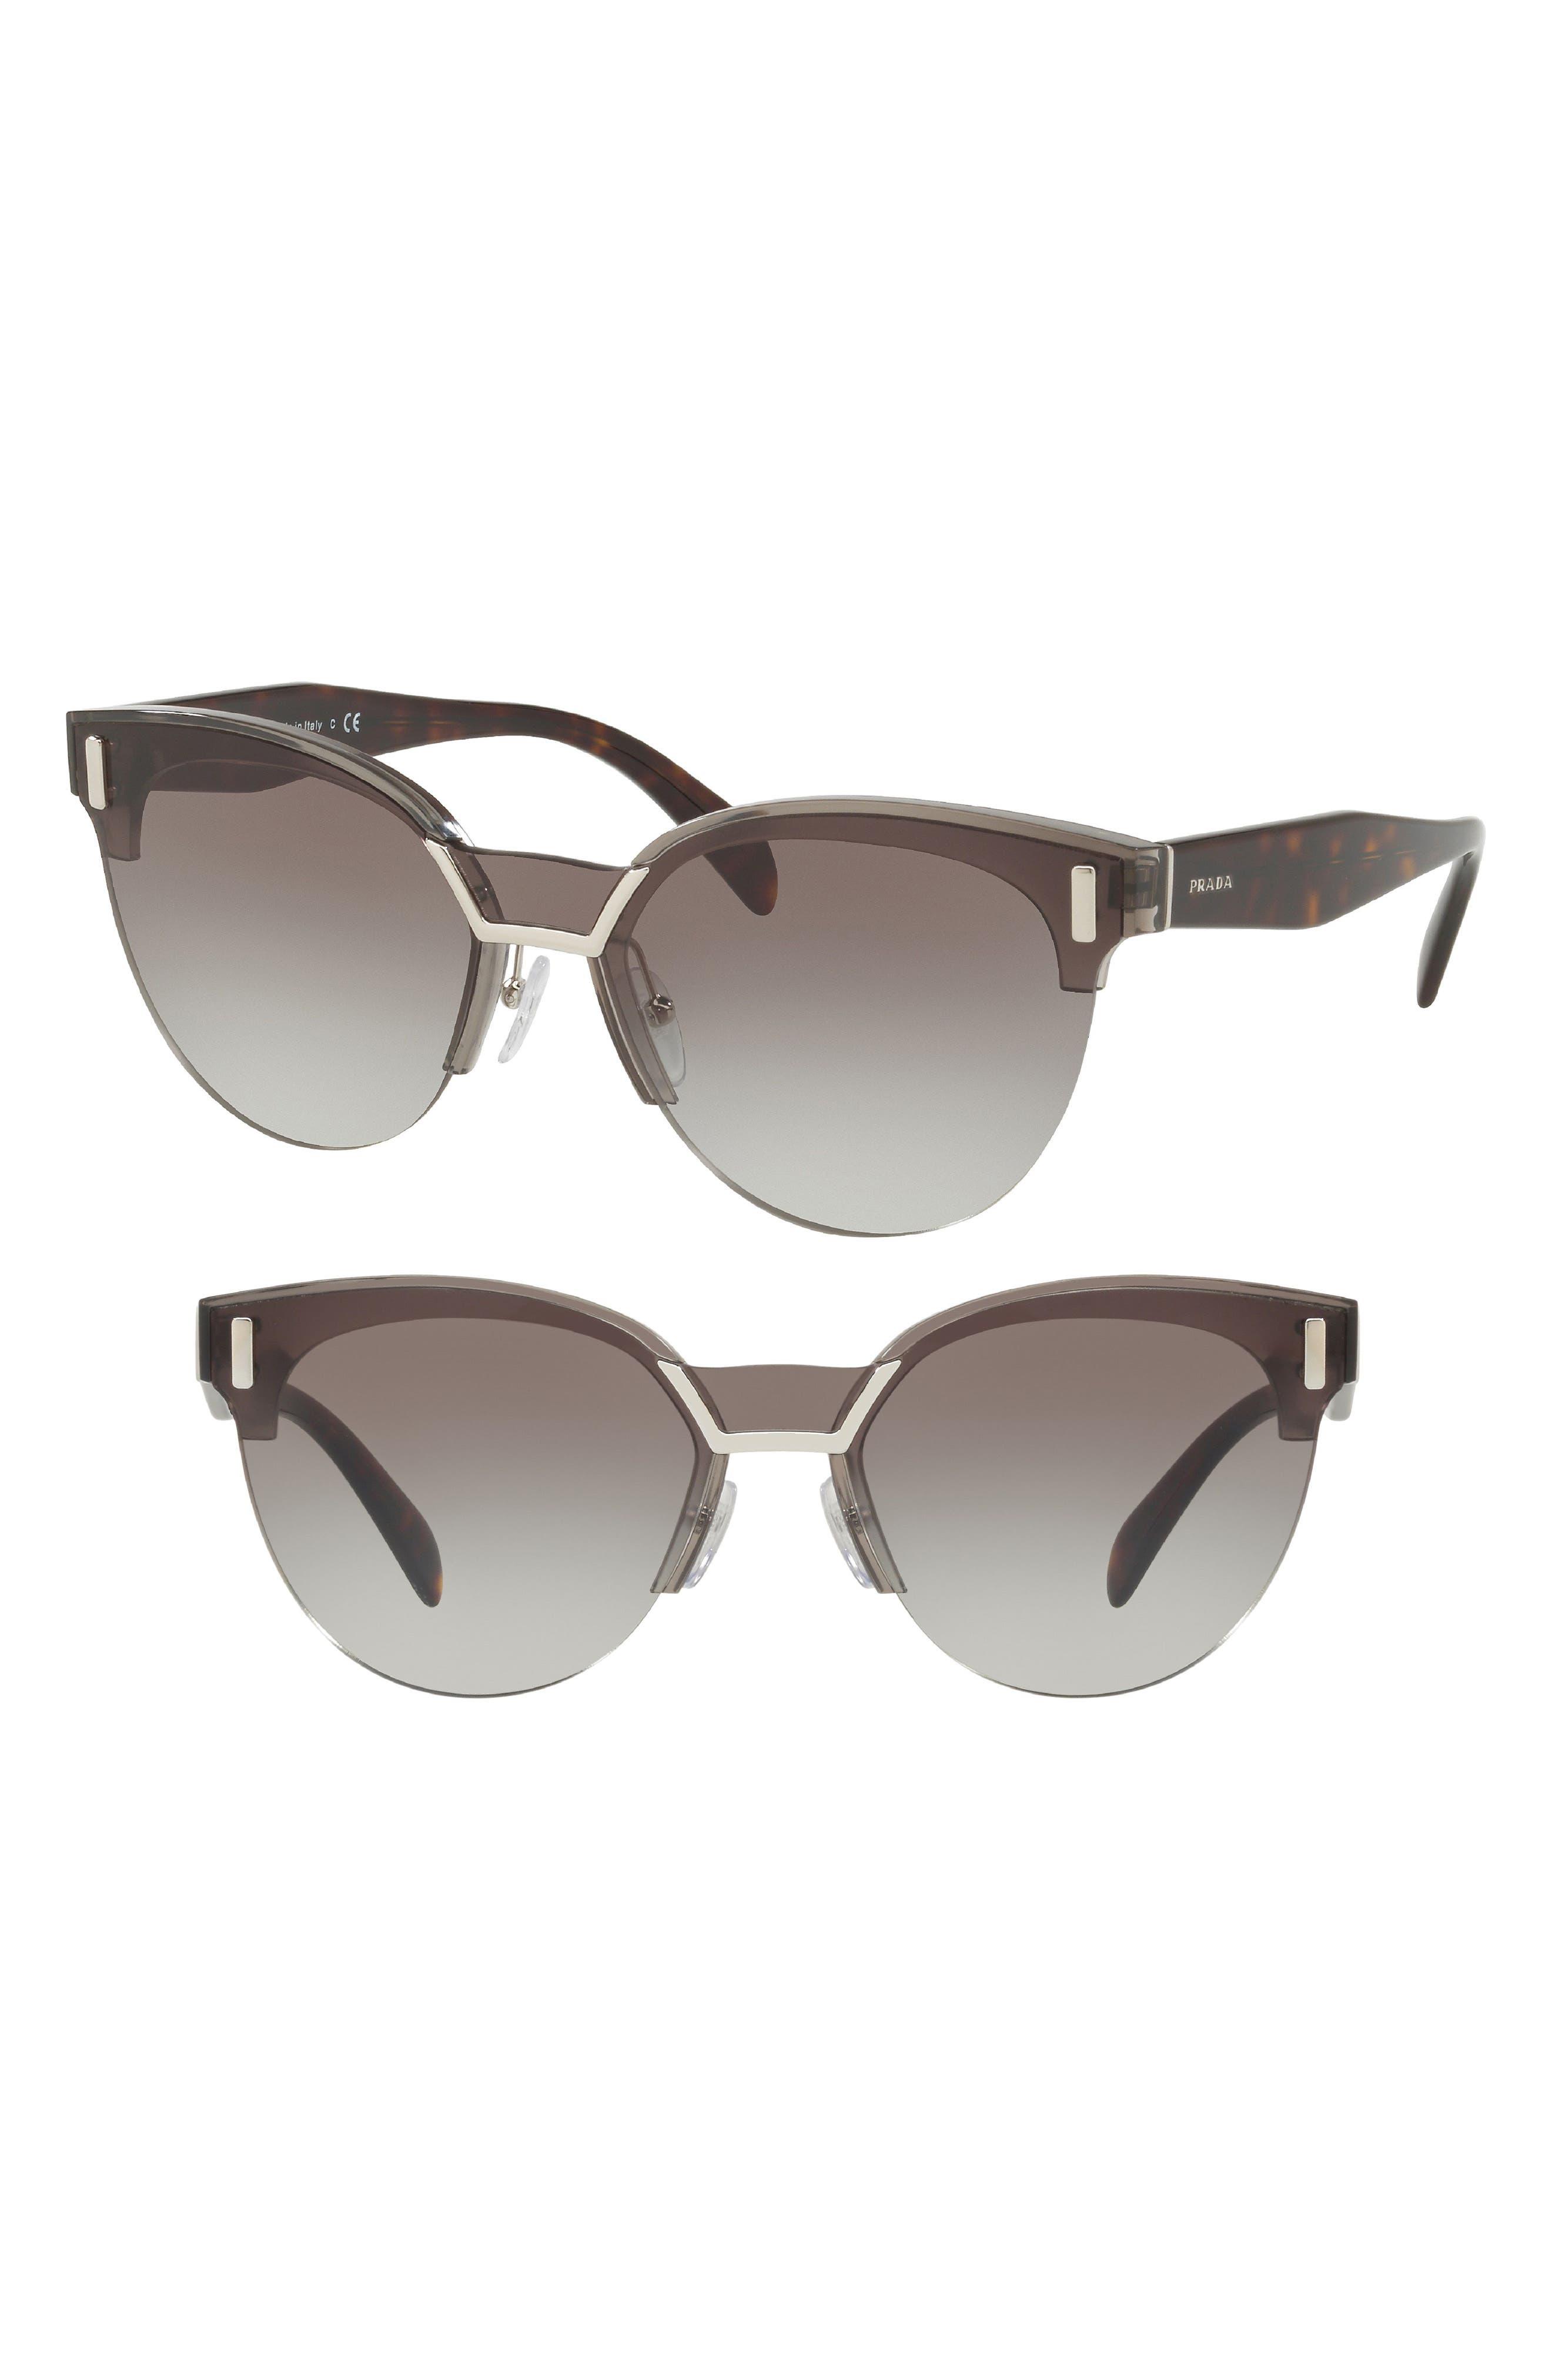 50mm Semi Rimless Gradient Sunglasses,                             Alternate thumbnail 2, color,                             025